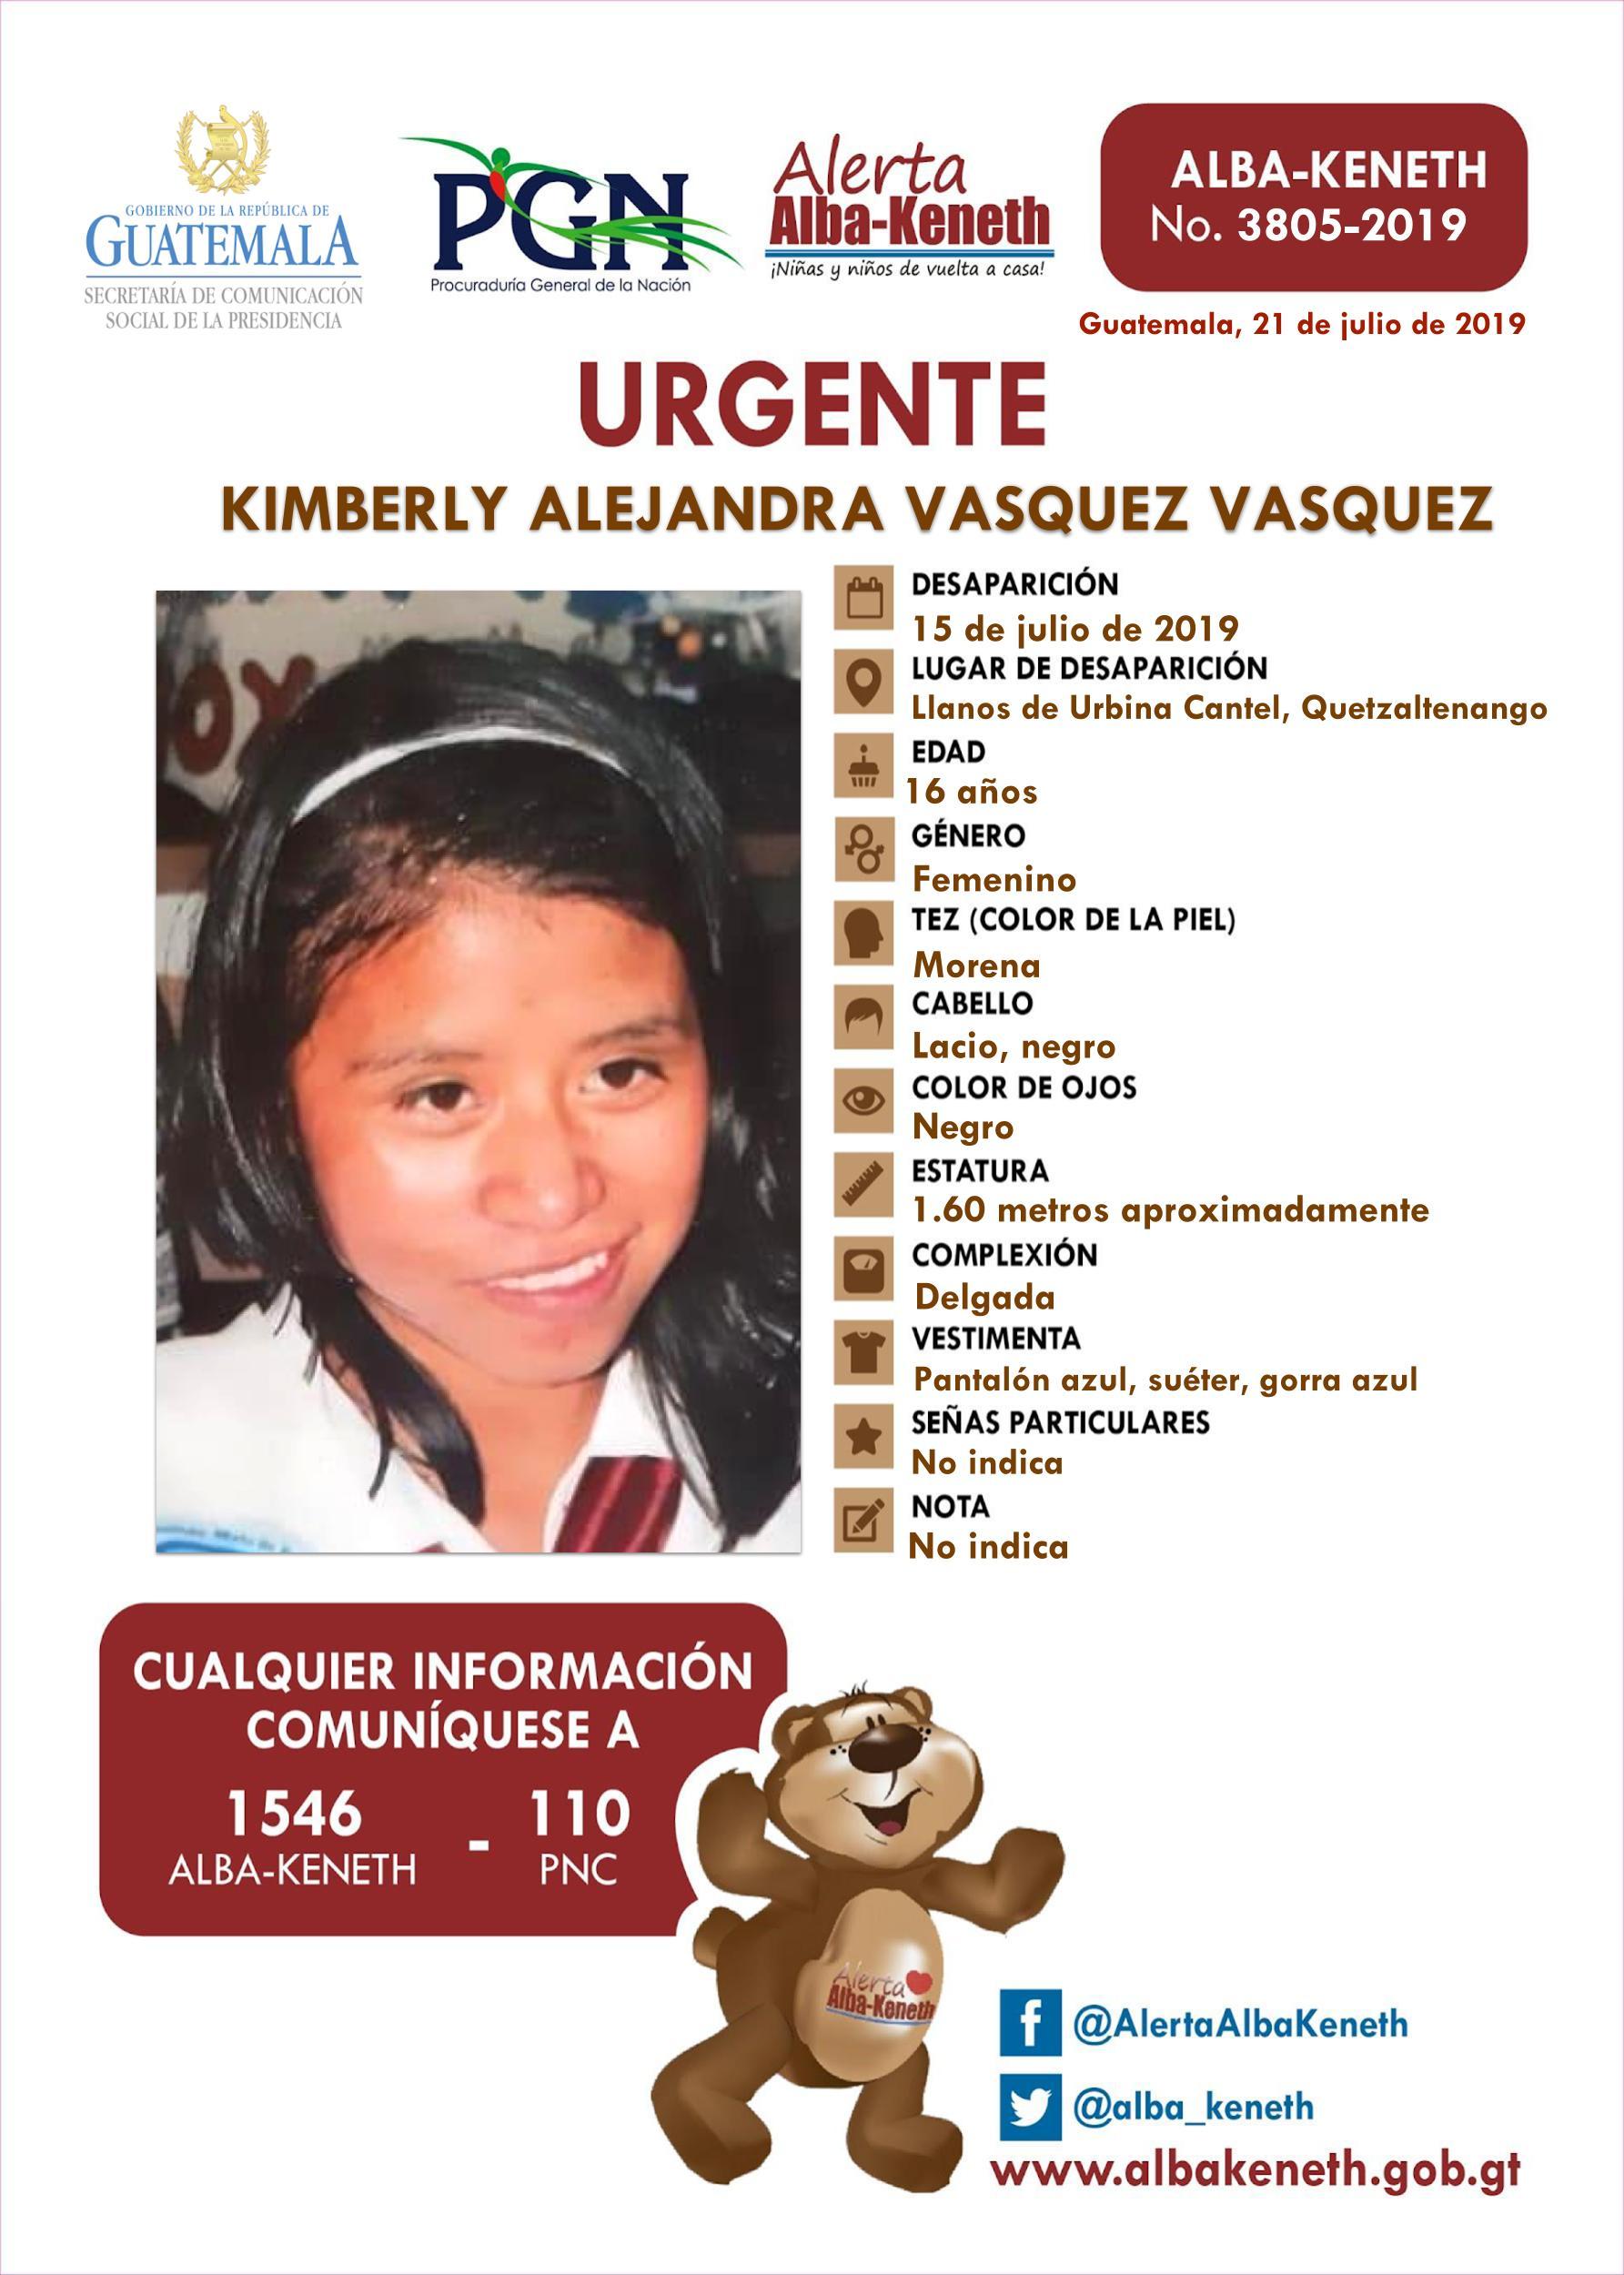 Kimberly Alejandra Vasquez Vasquez